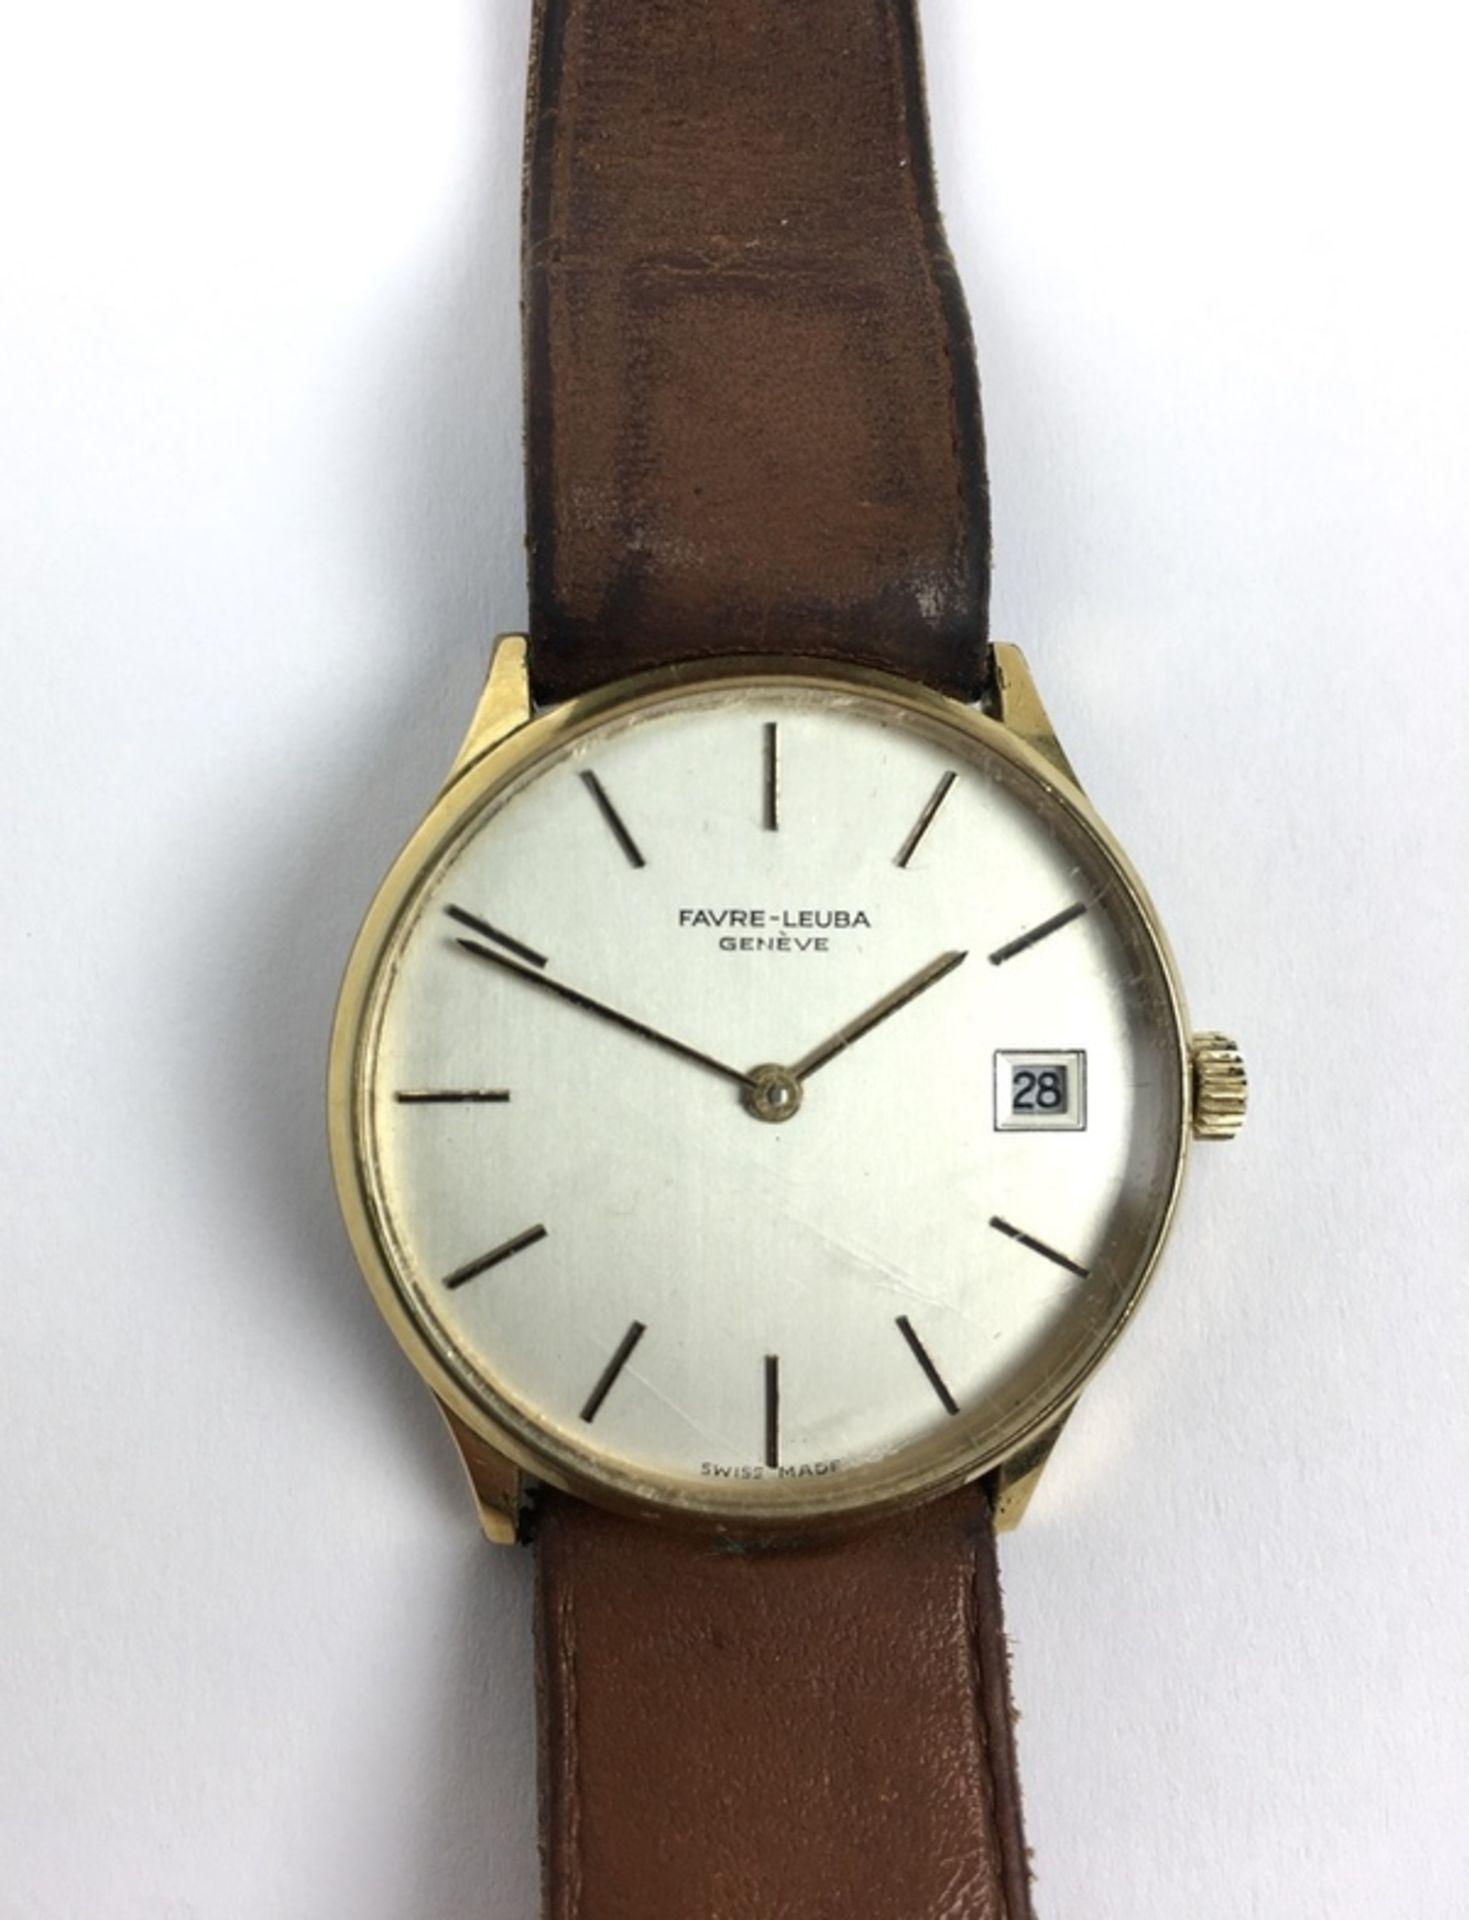 (Sieraden) Horloge Favre-Leuba GeneveVintage heren horloge Favre-Leuba Geneve. Conditie: In wer - Image 2 of 3